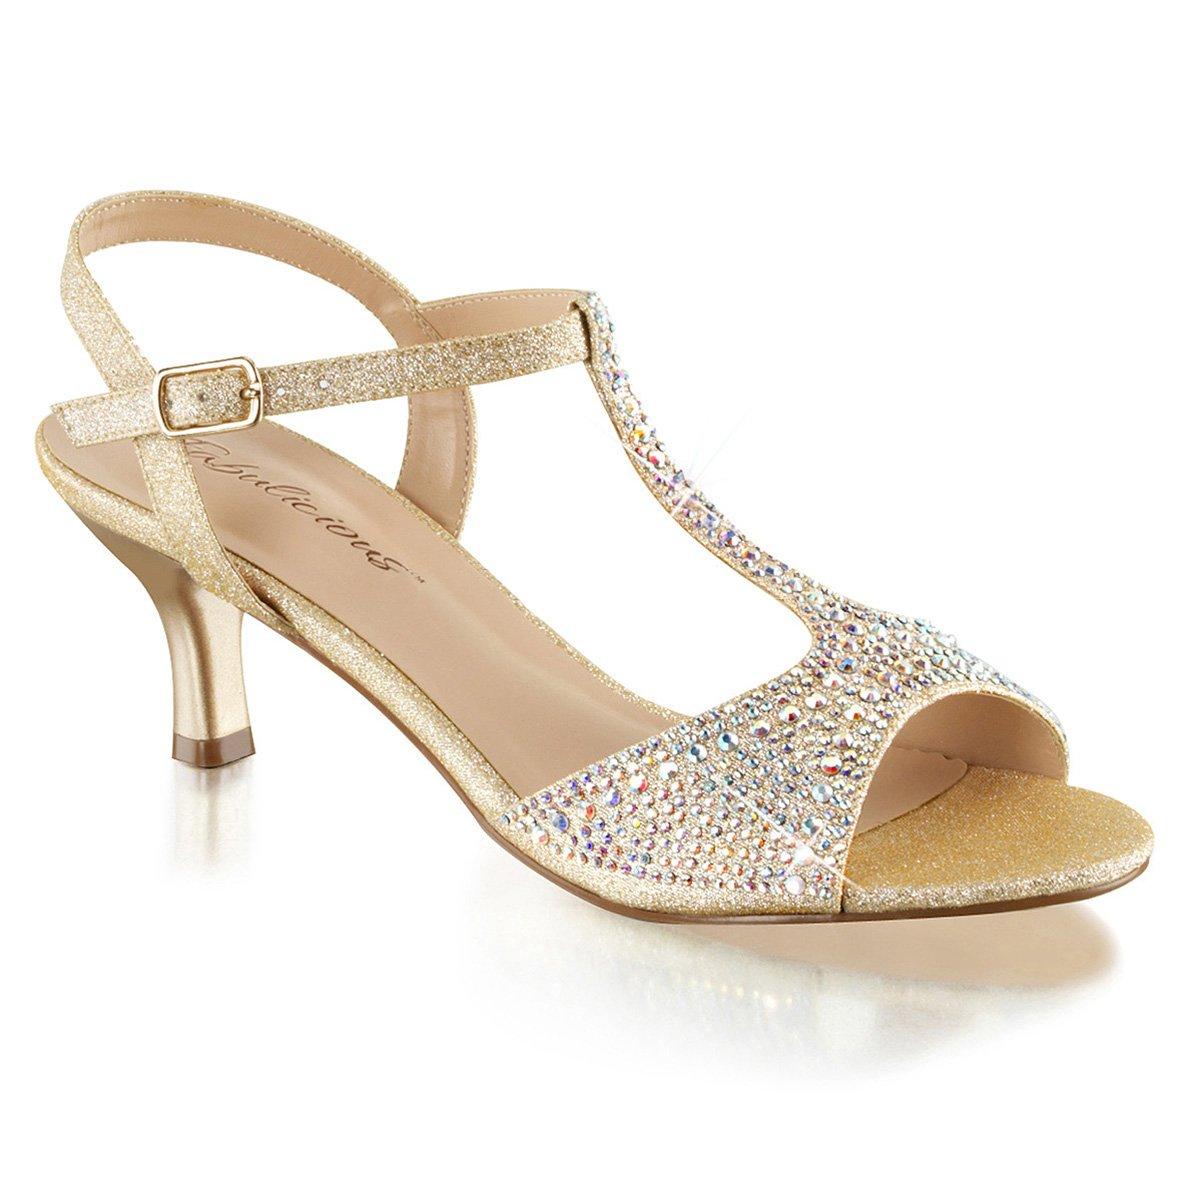 05a85bbea8baf Summitfashions Womens T Strap Sandal Nude Kitten Heel Shoes Sparkly  Rhinestone 2 1/2 Inch Heel